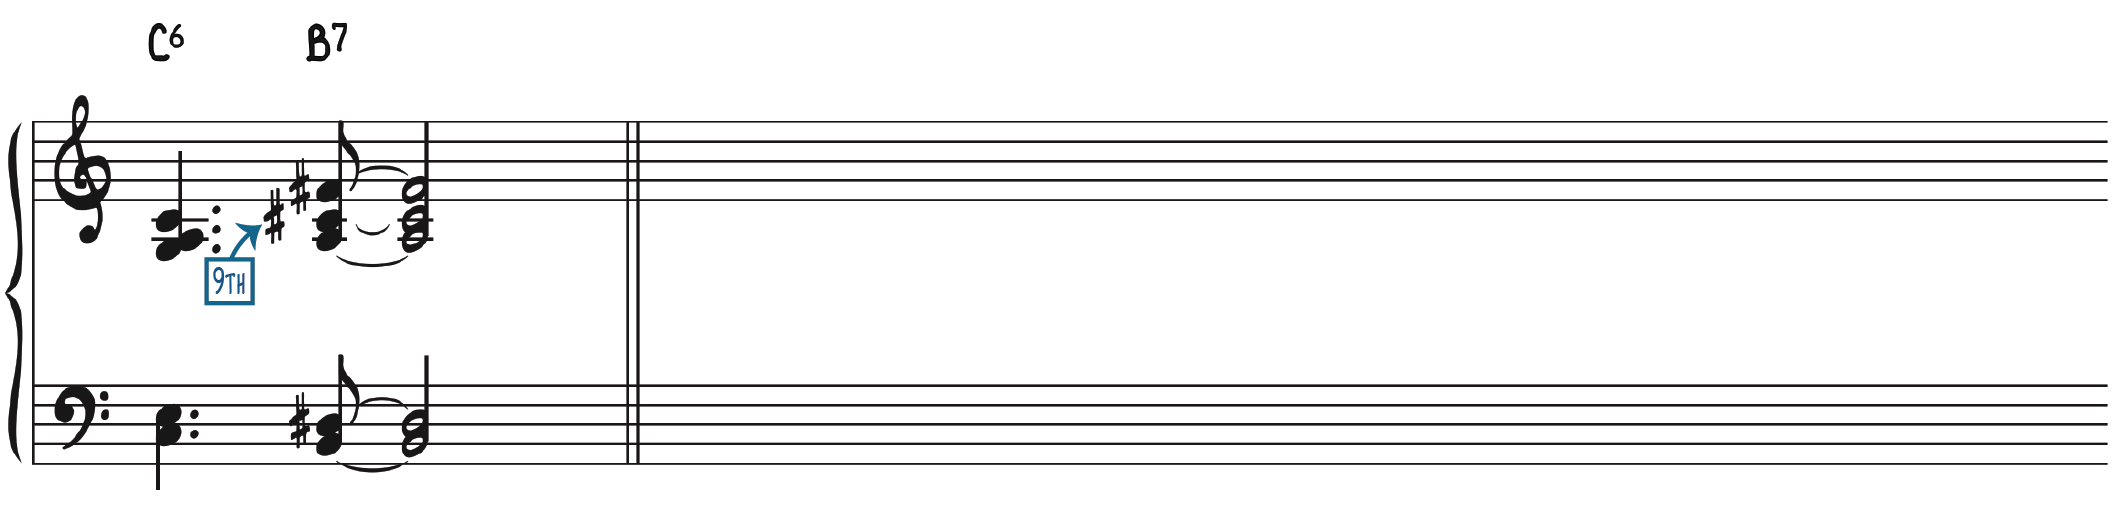 Dominant 9th Chord